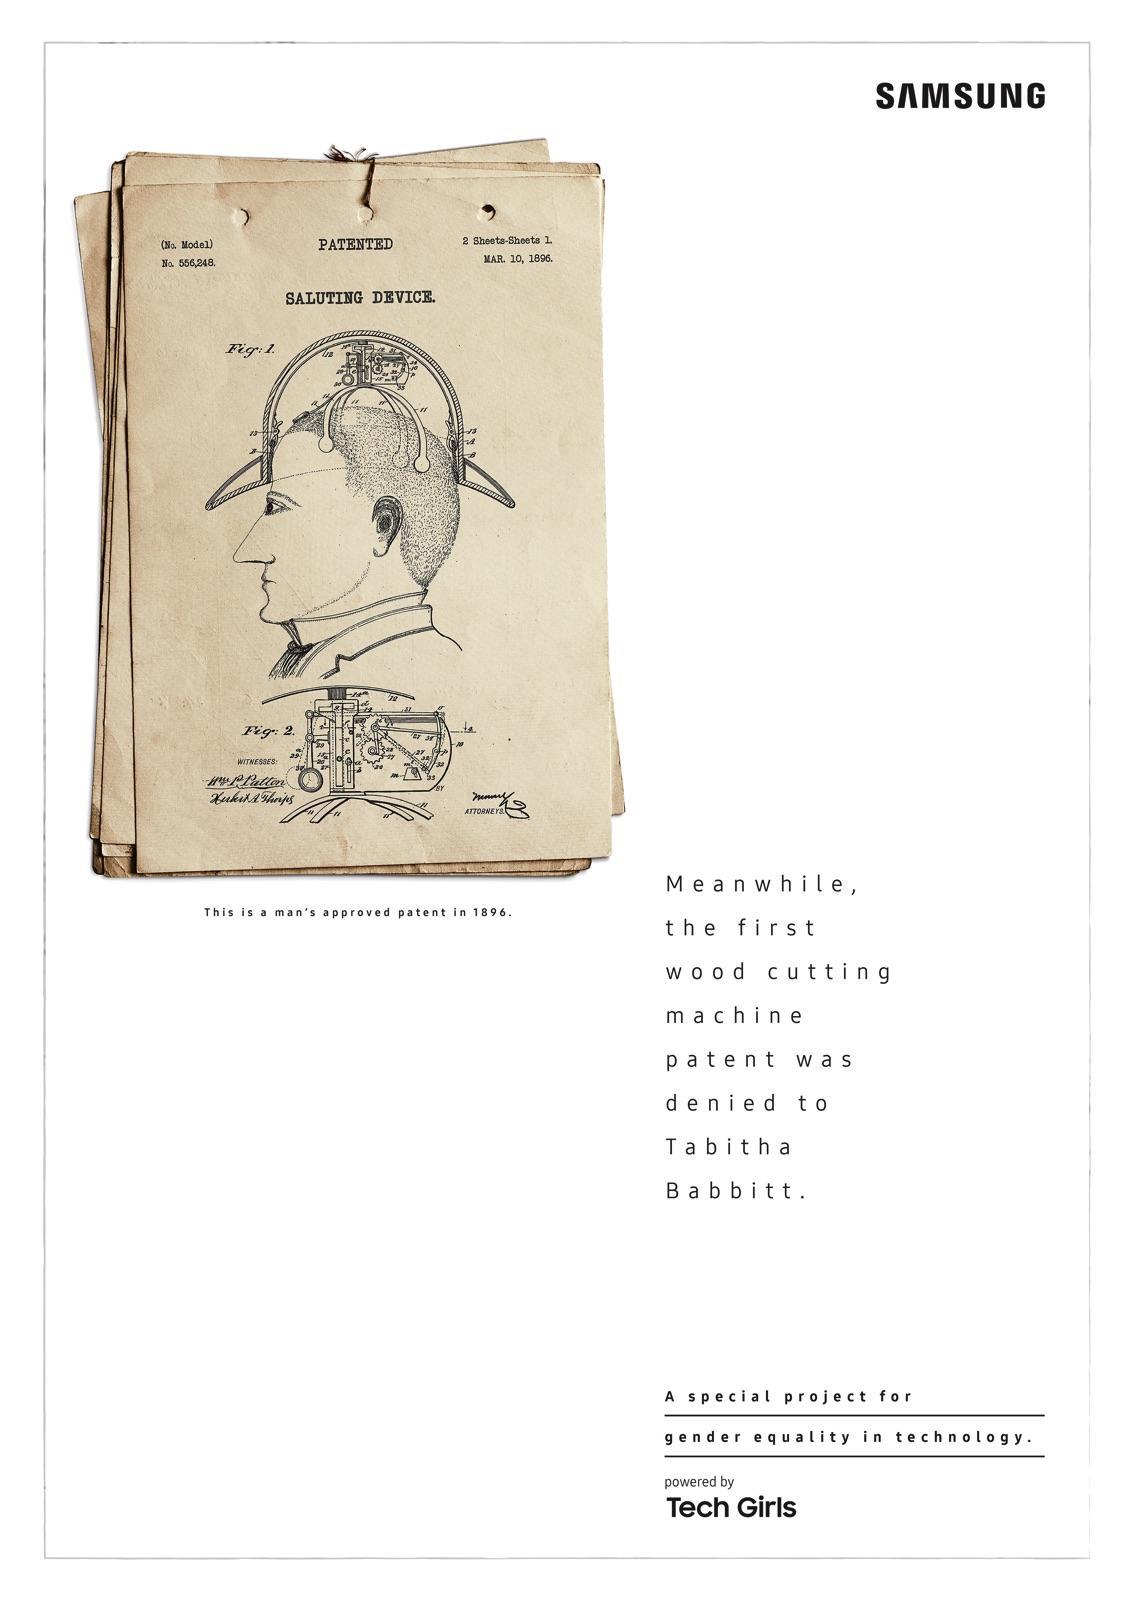 Samsung Print Ad - Dumb Patents - Saluting Device